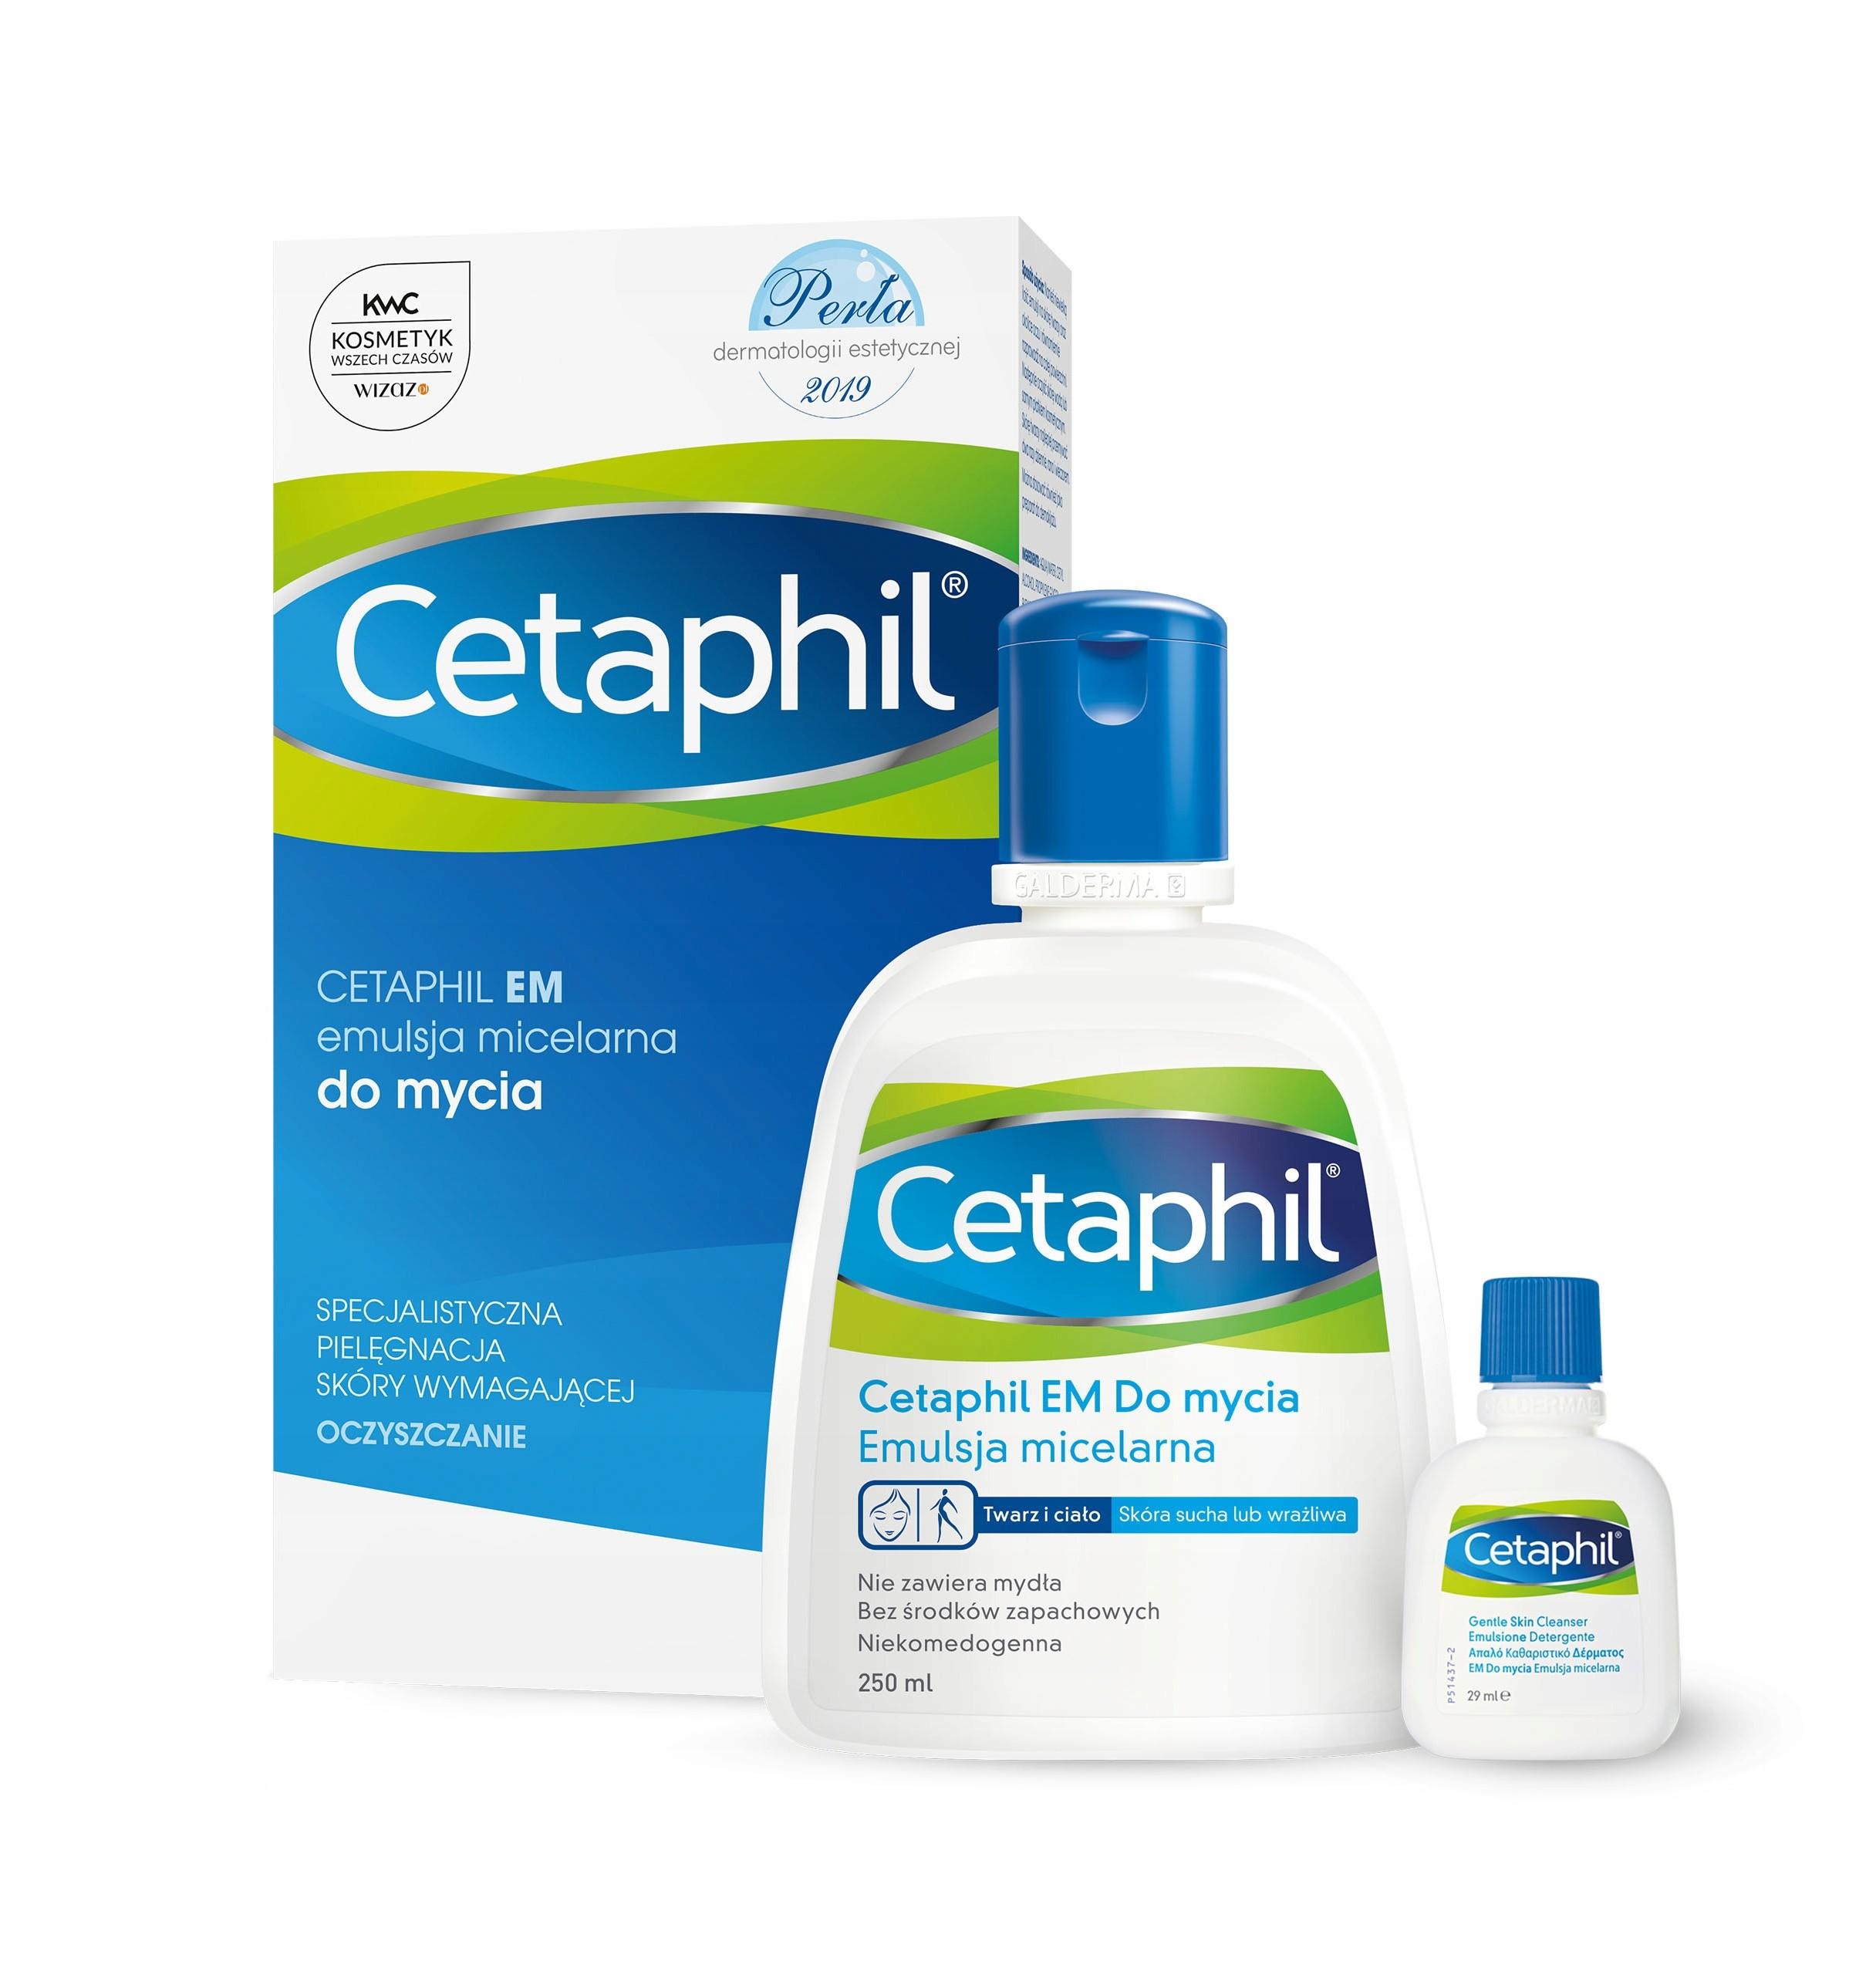 Cetaphil Em Emulsja 250 ml i mini produkt Em 29 ml